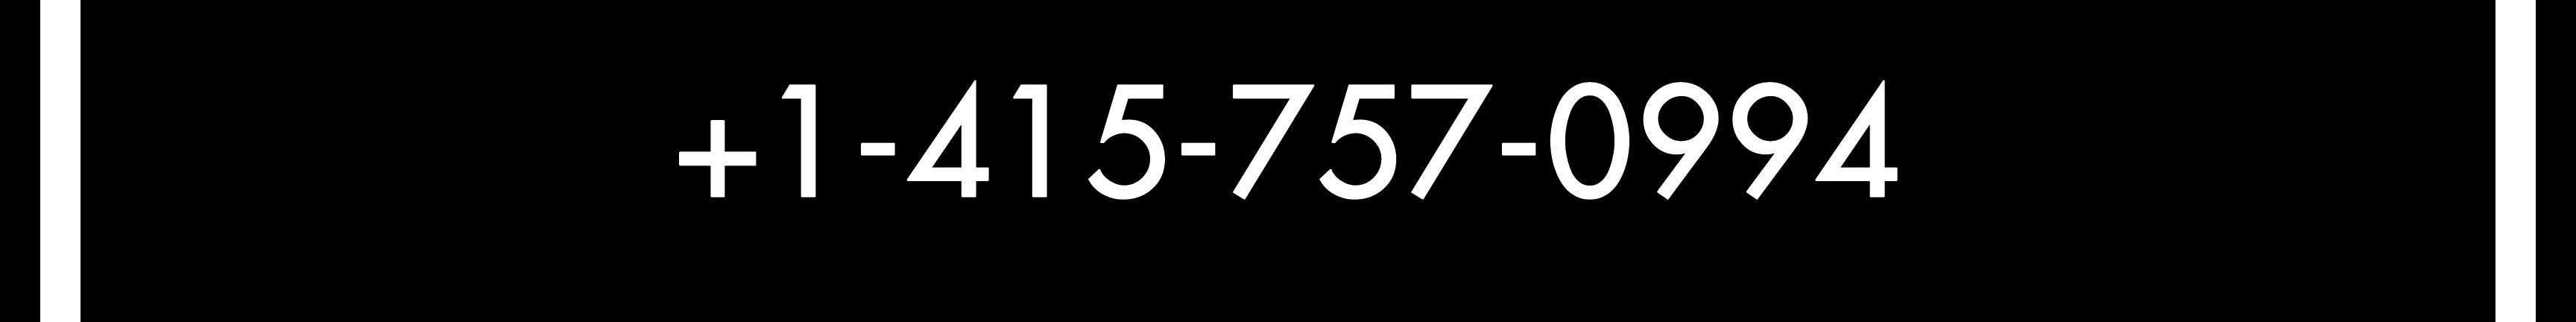 1-415-757-0994